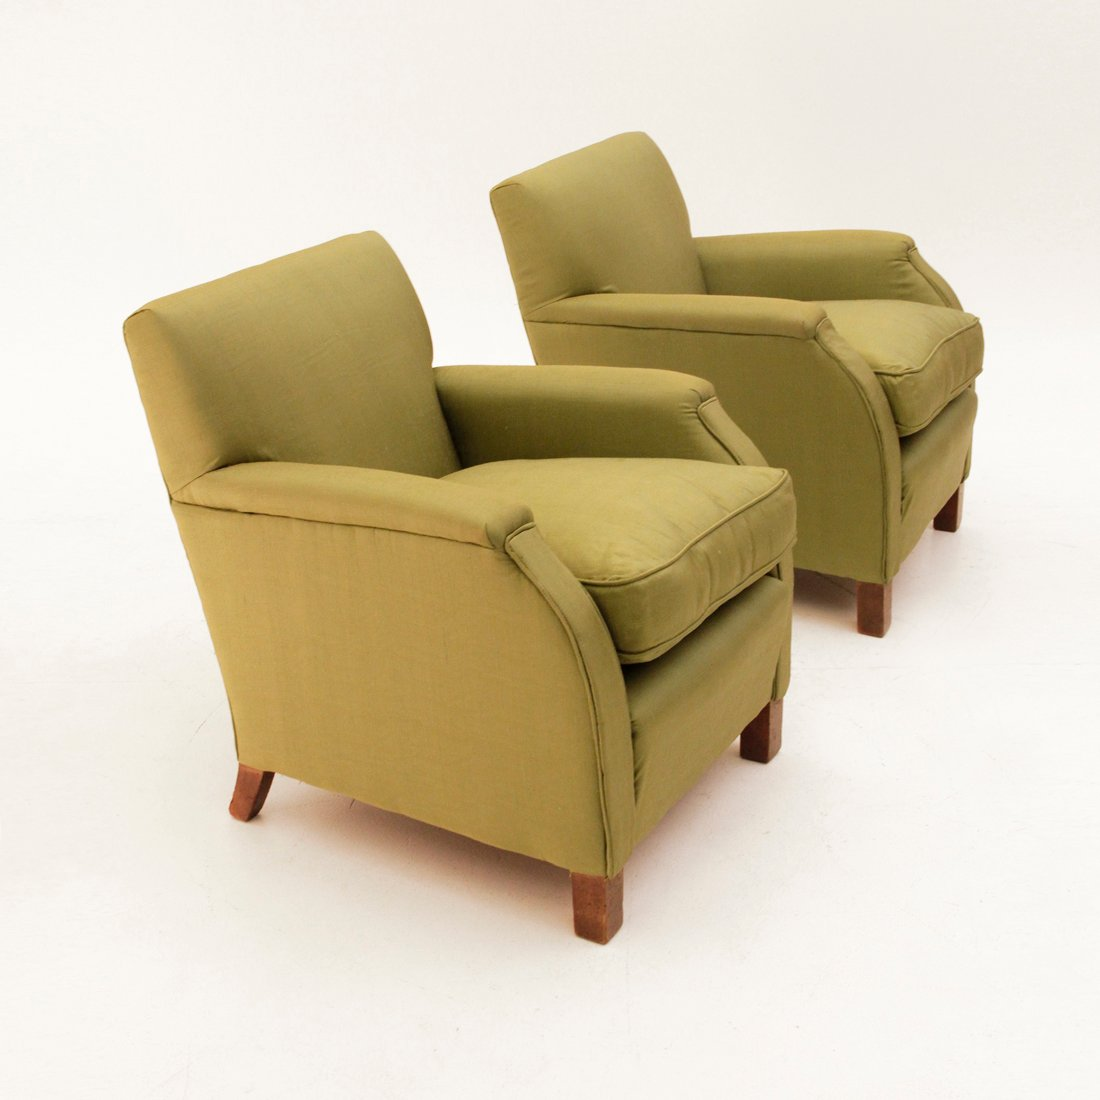 italienische gr ne sessel 1930er 2er set bei pamono kaufen. Black Bedroom Furniture Sets. Home Design Ideas